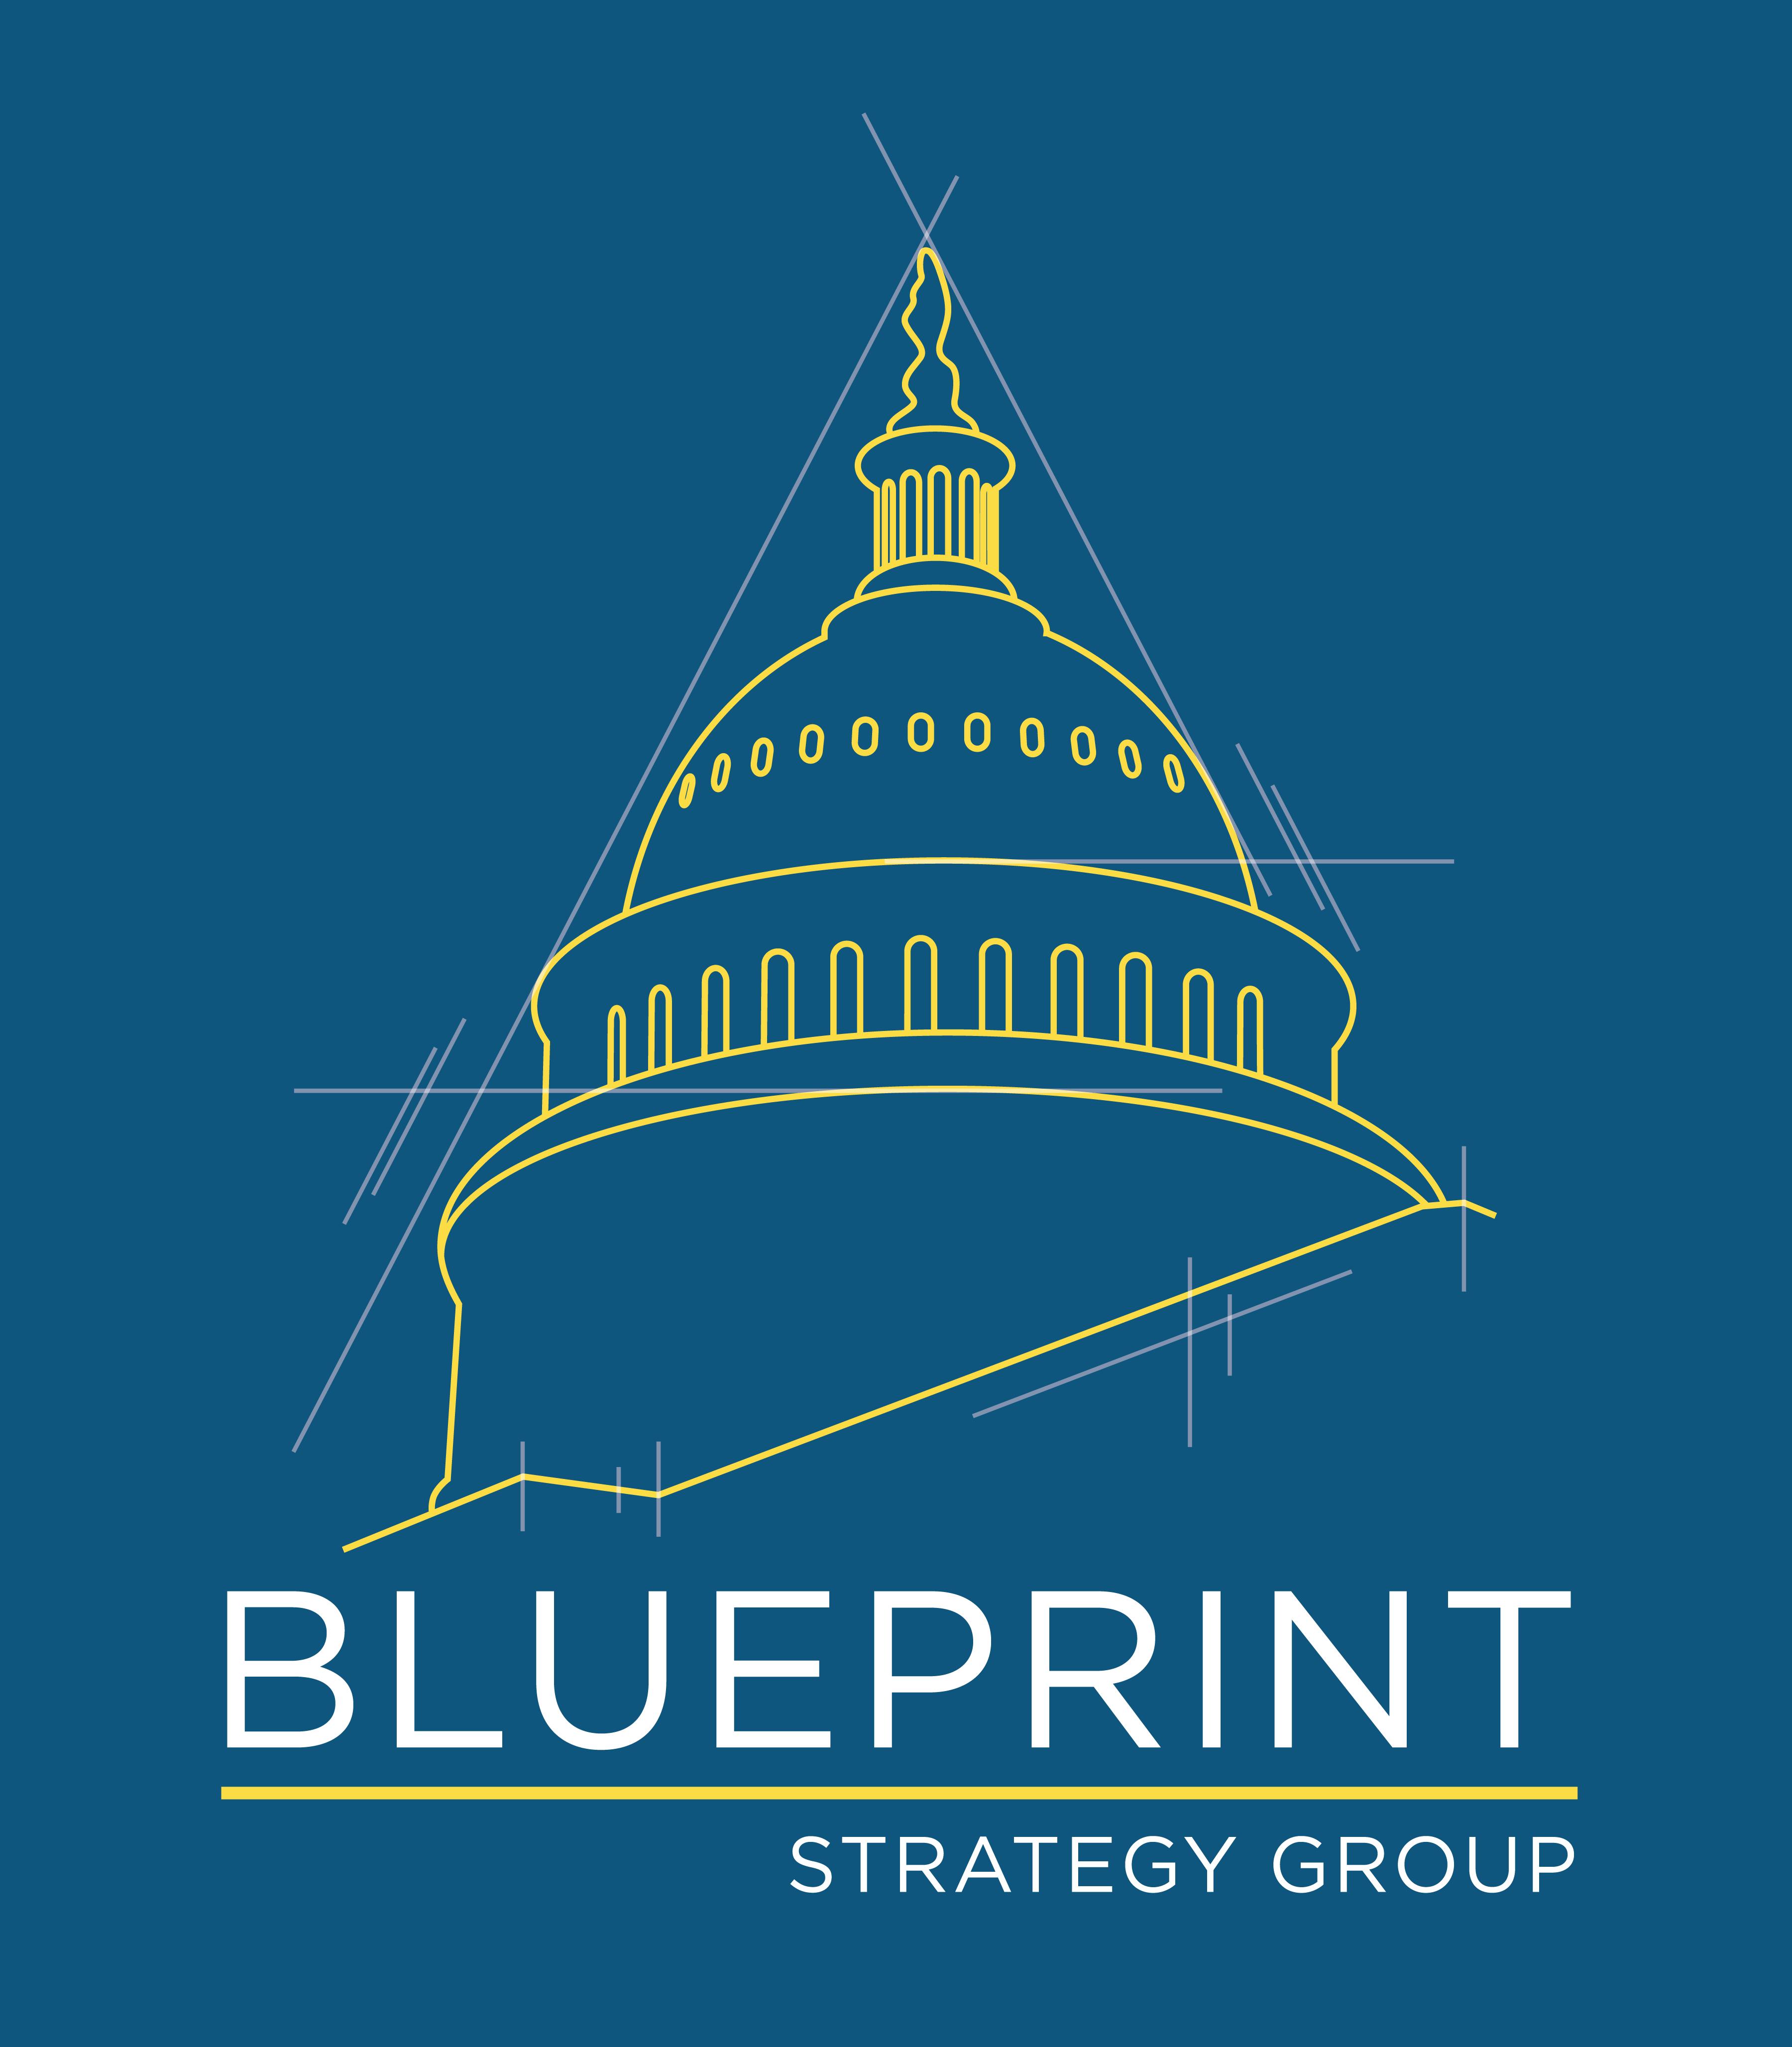 Blueprint Strategy Group